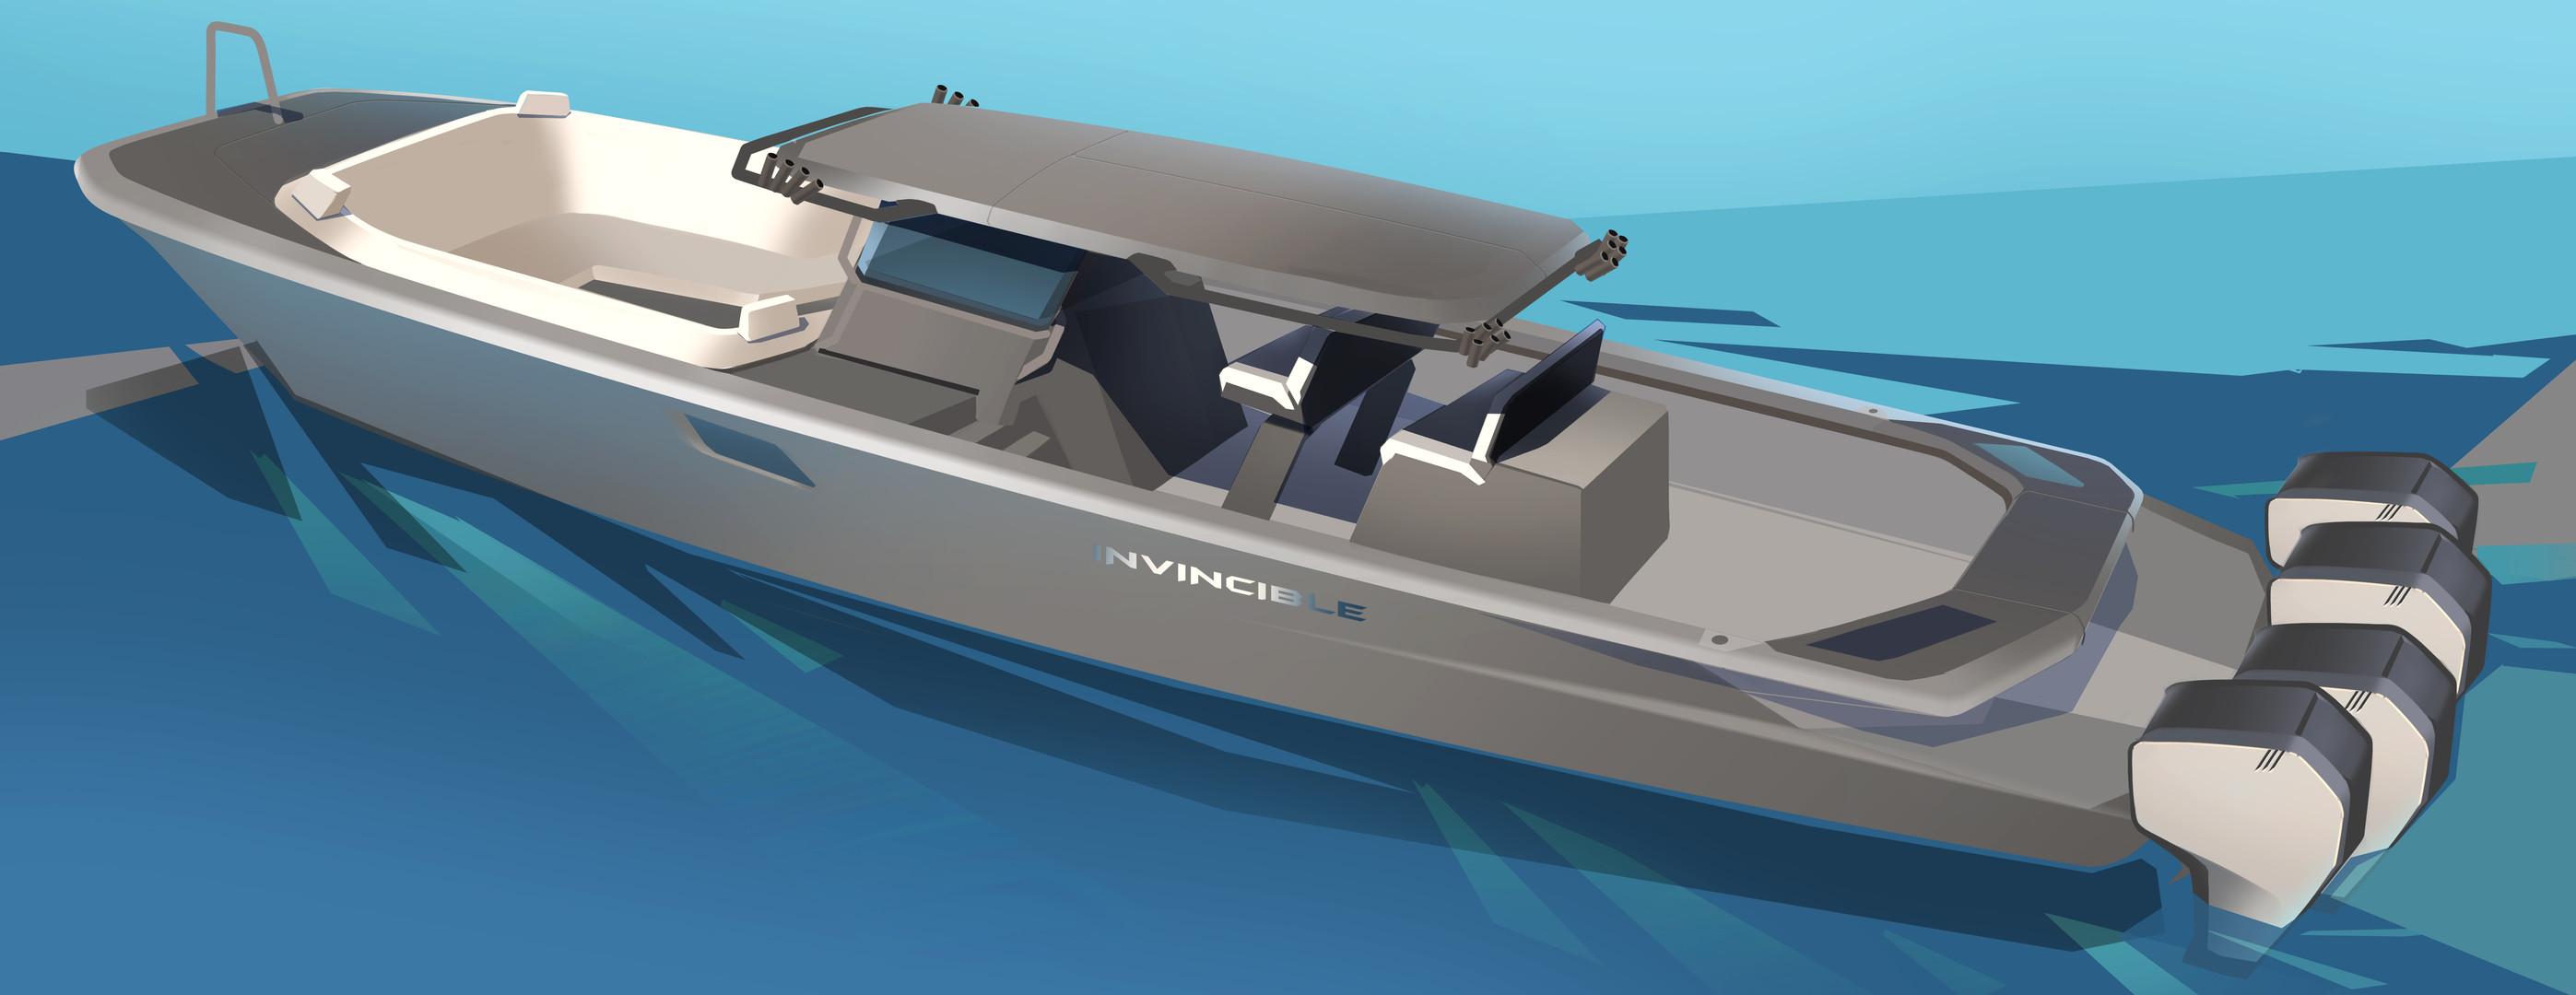 Boat theme render 1.jpg